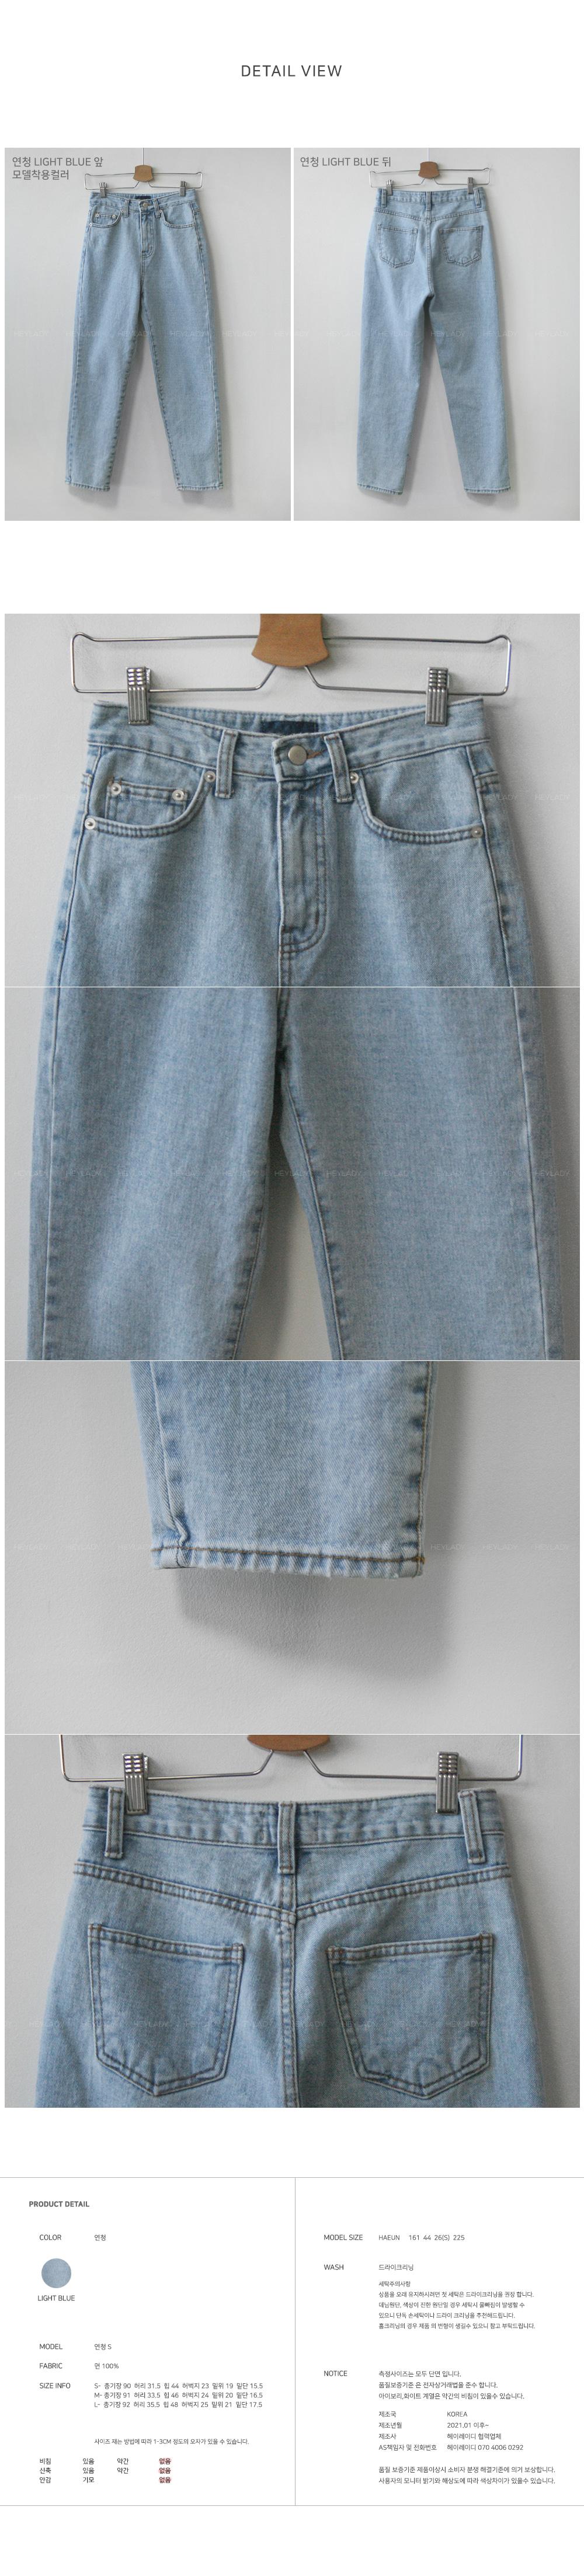 Solvay straight denim pants